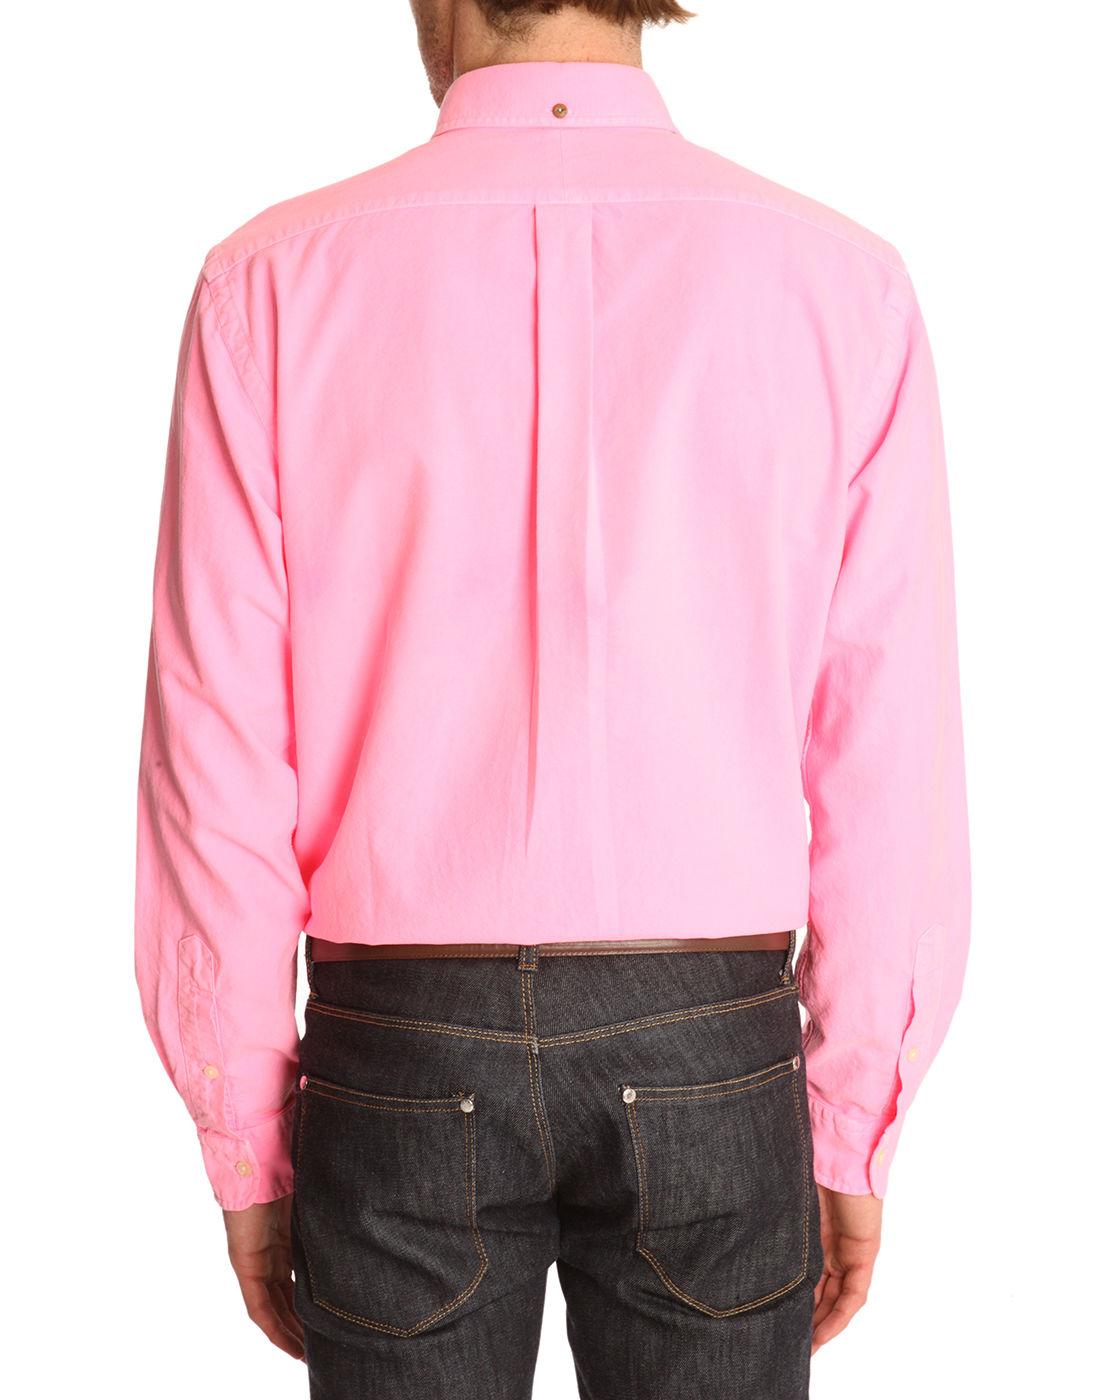 polo ralph lauren washed electric pink slim fit oxford. Black Bedroom Furniture Sets. Home Design Ideas